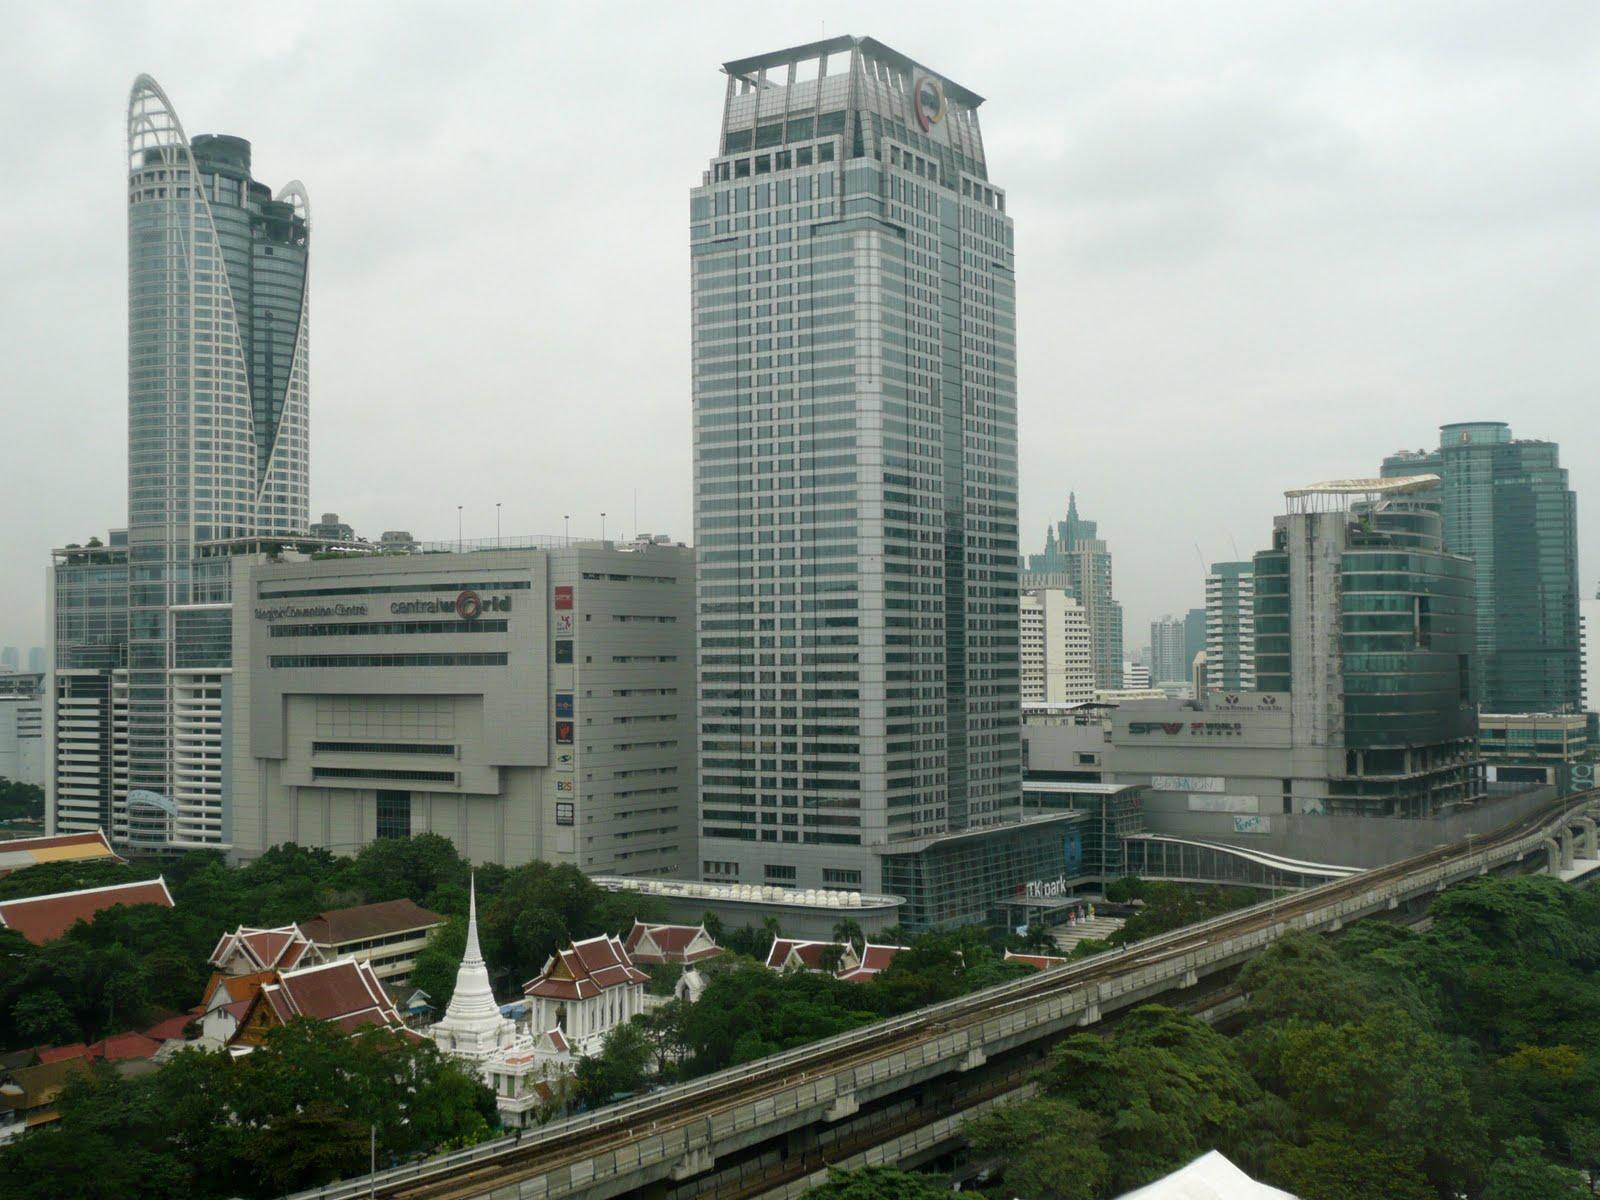 http://1.bp.blogspot.com/-Egb3Uw7FR_w/TqfAtXmvhbI/AAAAAAAADTk/bU0wIh9W0WA/s1600/Bangkok+buildings.jpg